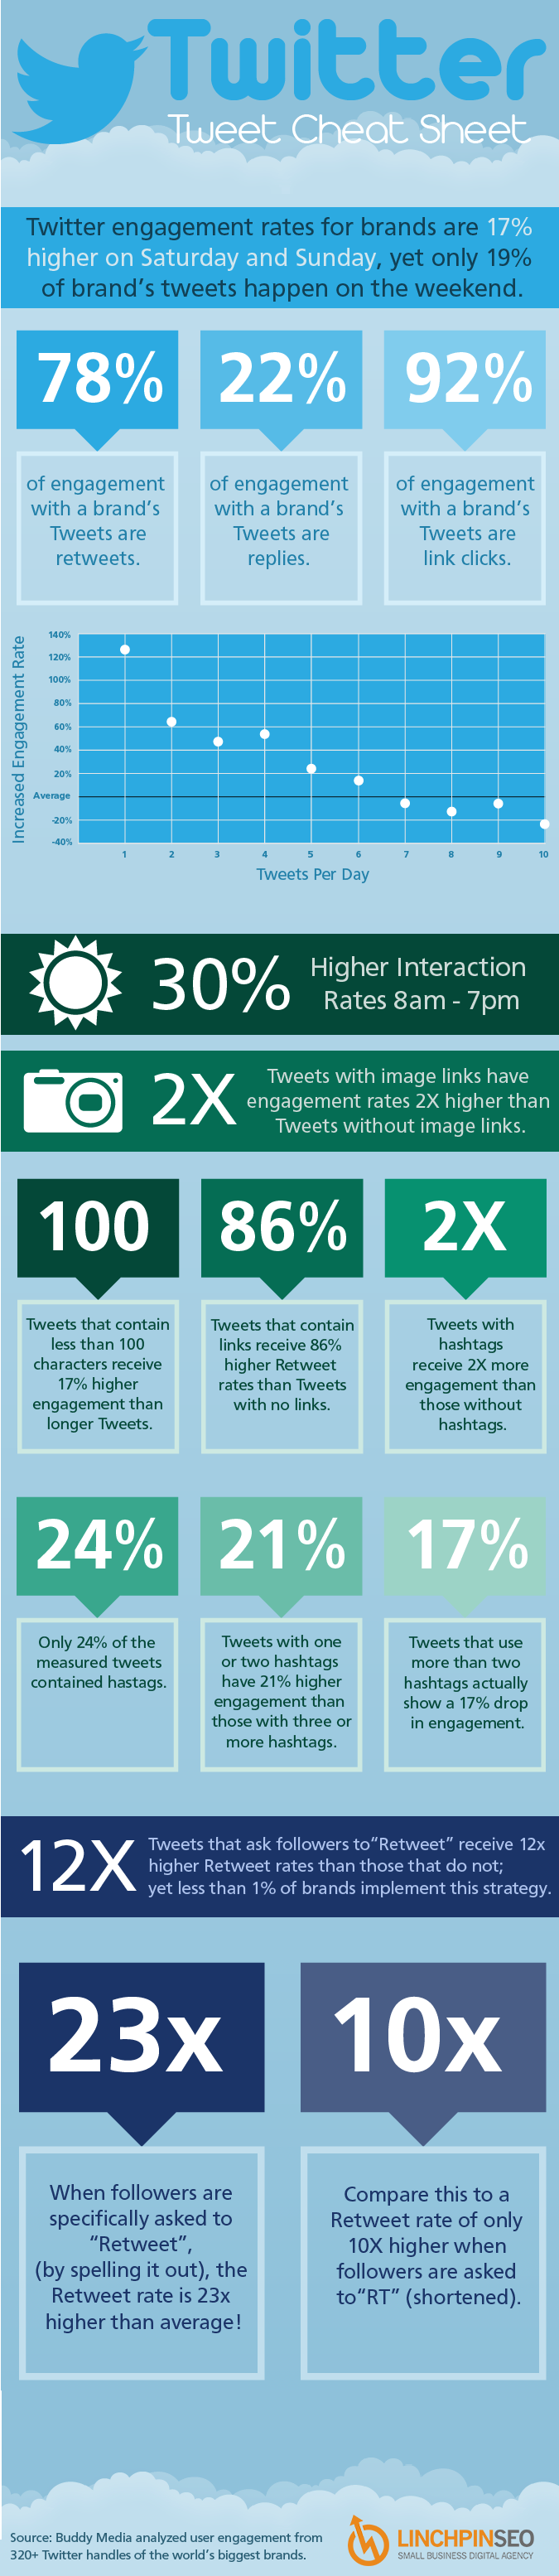 Image courtesy of Mobile Marketing Watch